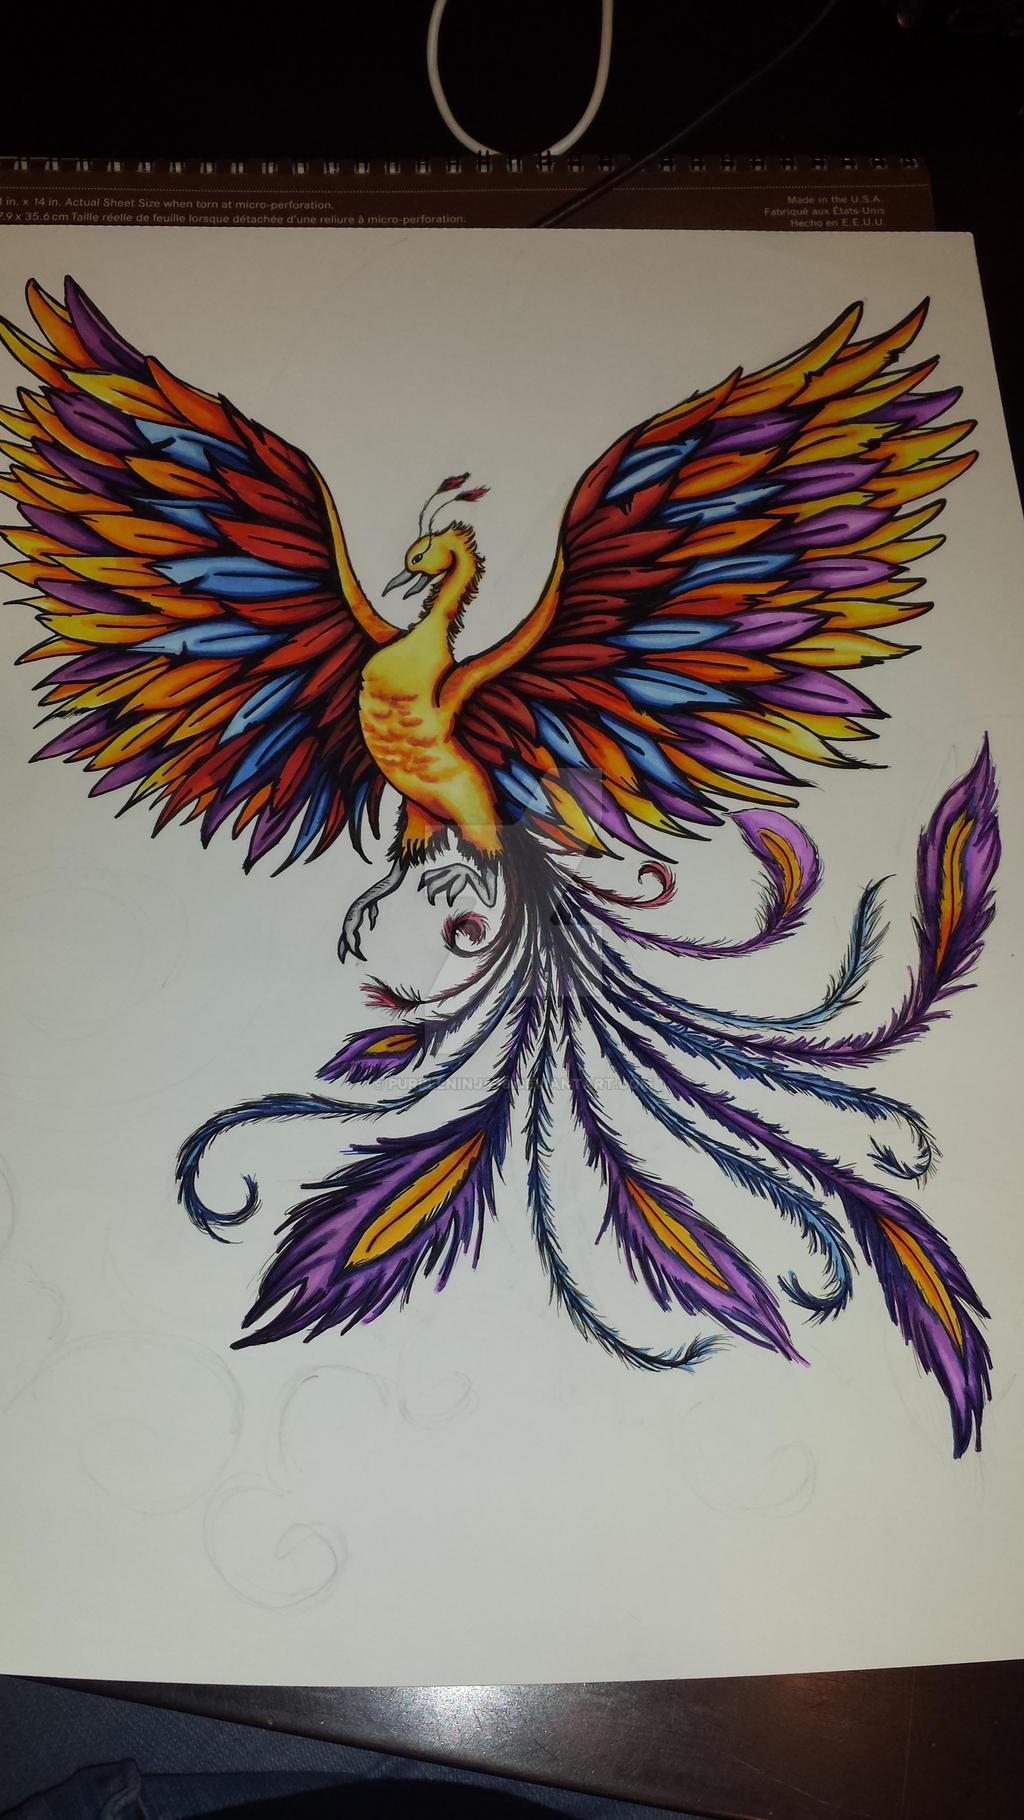 Rainbow Phoenix by Purpleninja79